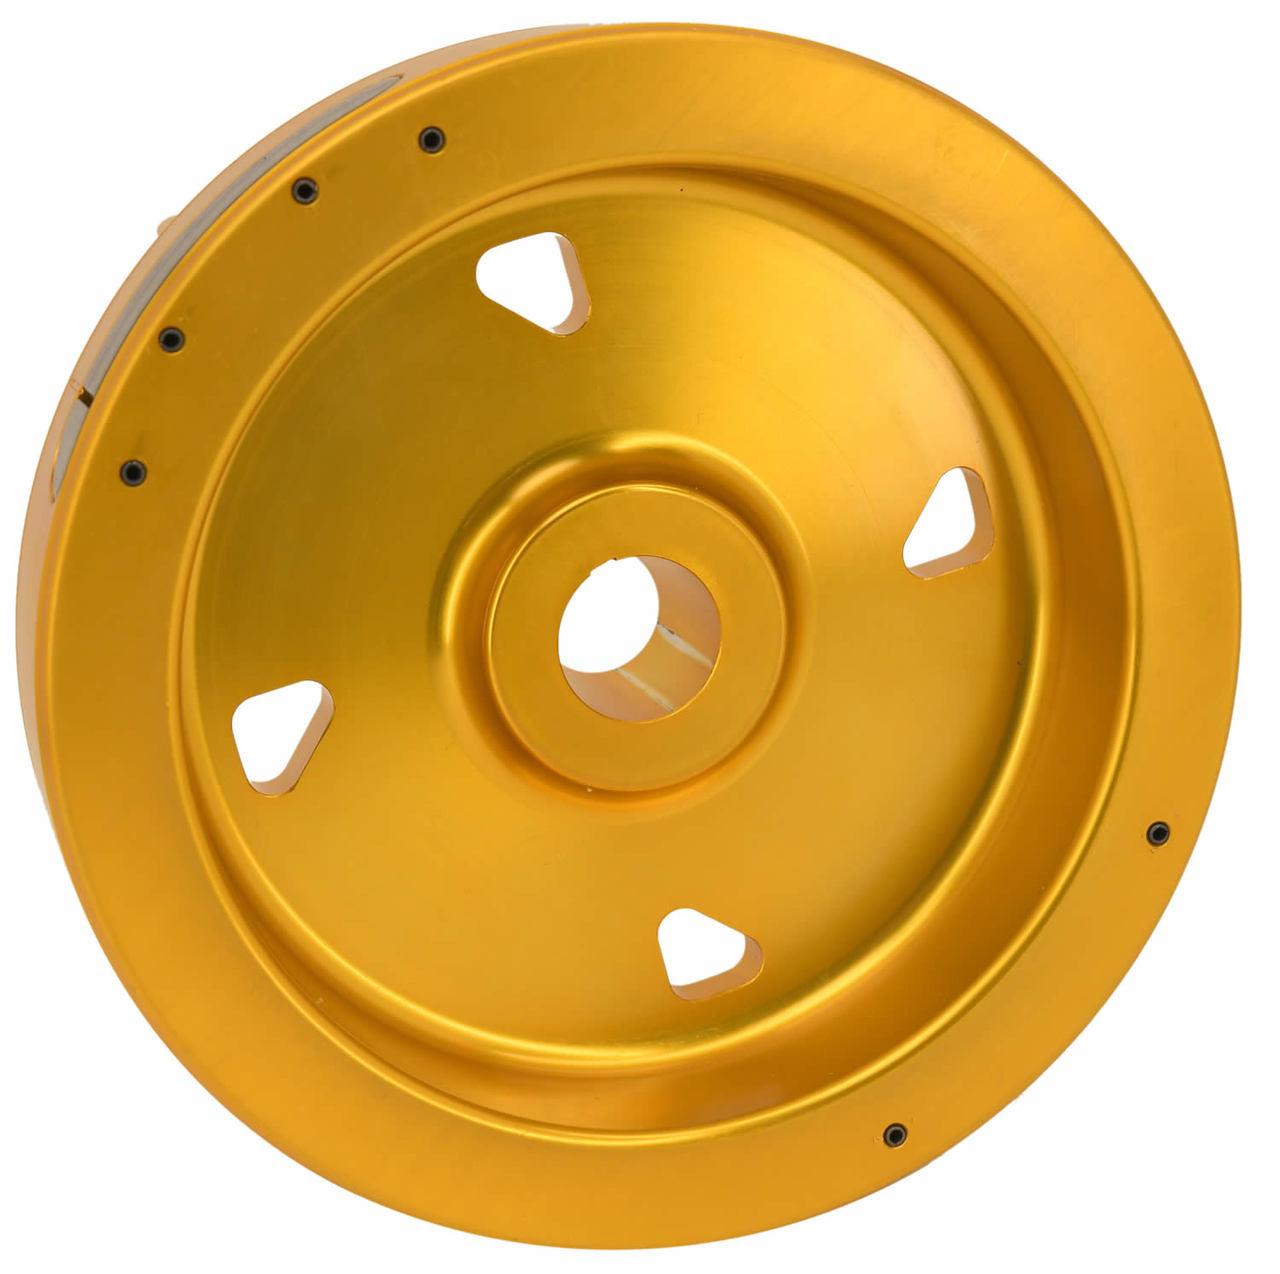 SlipStream Billet Flywheel: 212cc Hemi Predator